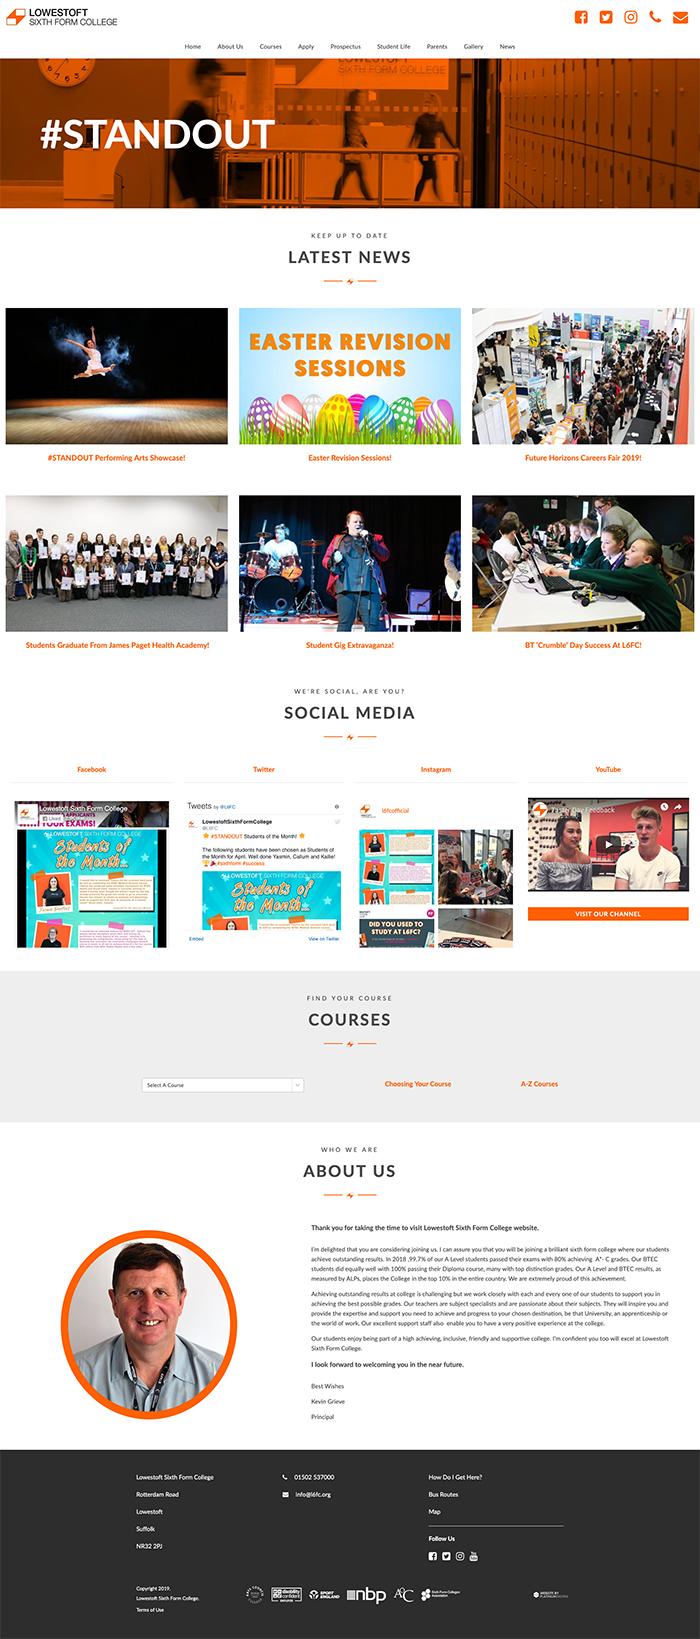 Lowestoft Sixth Form College Web Design